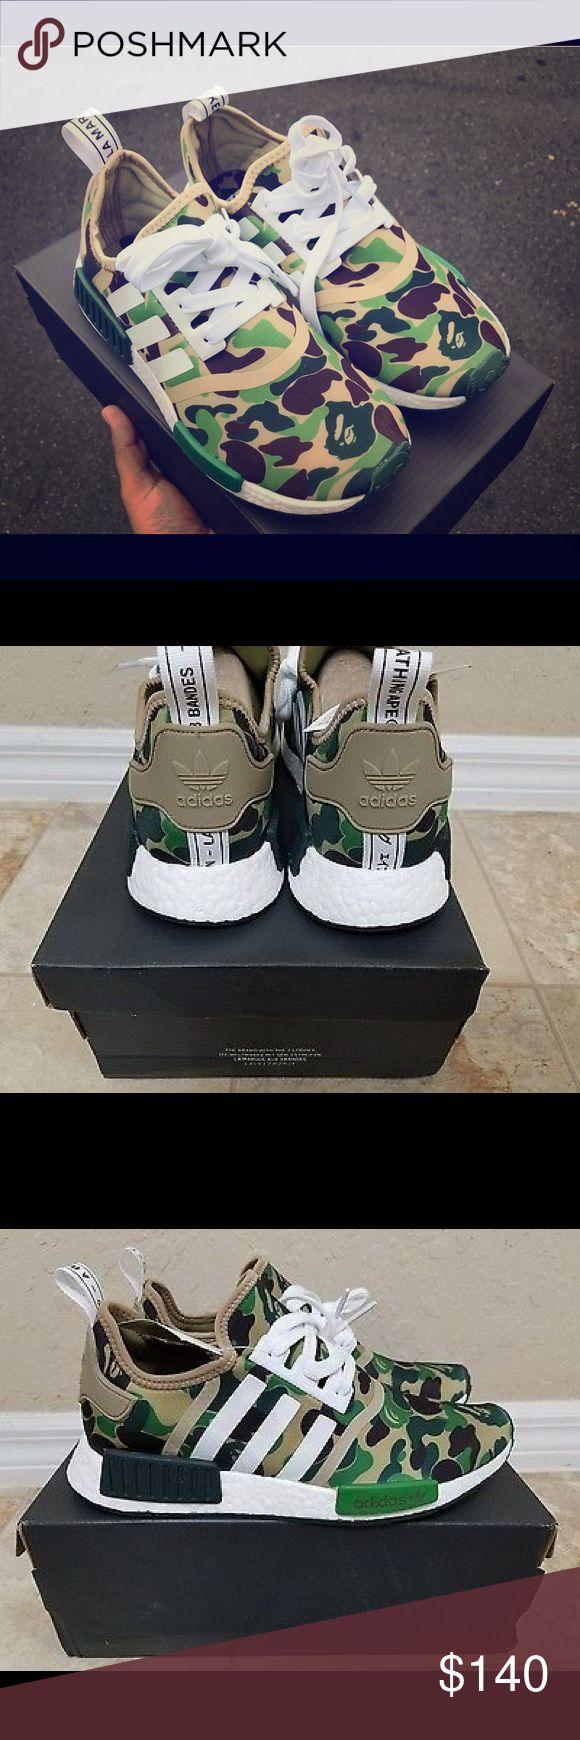 Adidas   NMD R1 Bape APE sizes ,5.5,6,6.5,7.5 Adidas Camuflaje  NMD R1 Bape BATHING APE Talla 9.5 Adidas Shoes Athletic Shoes